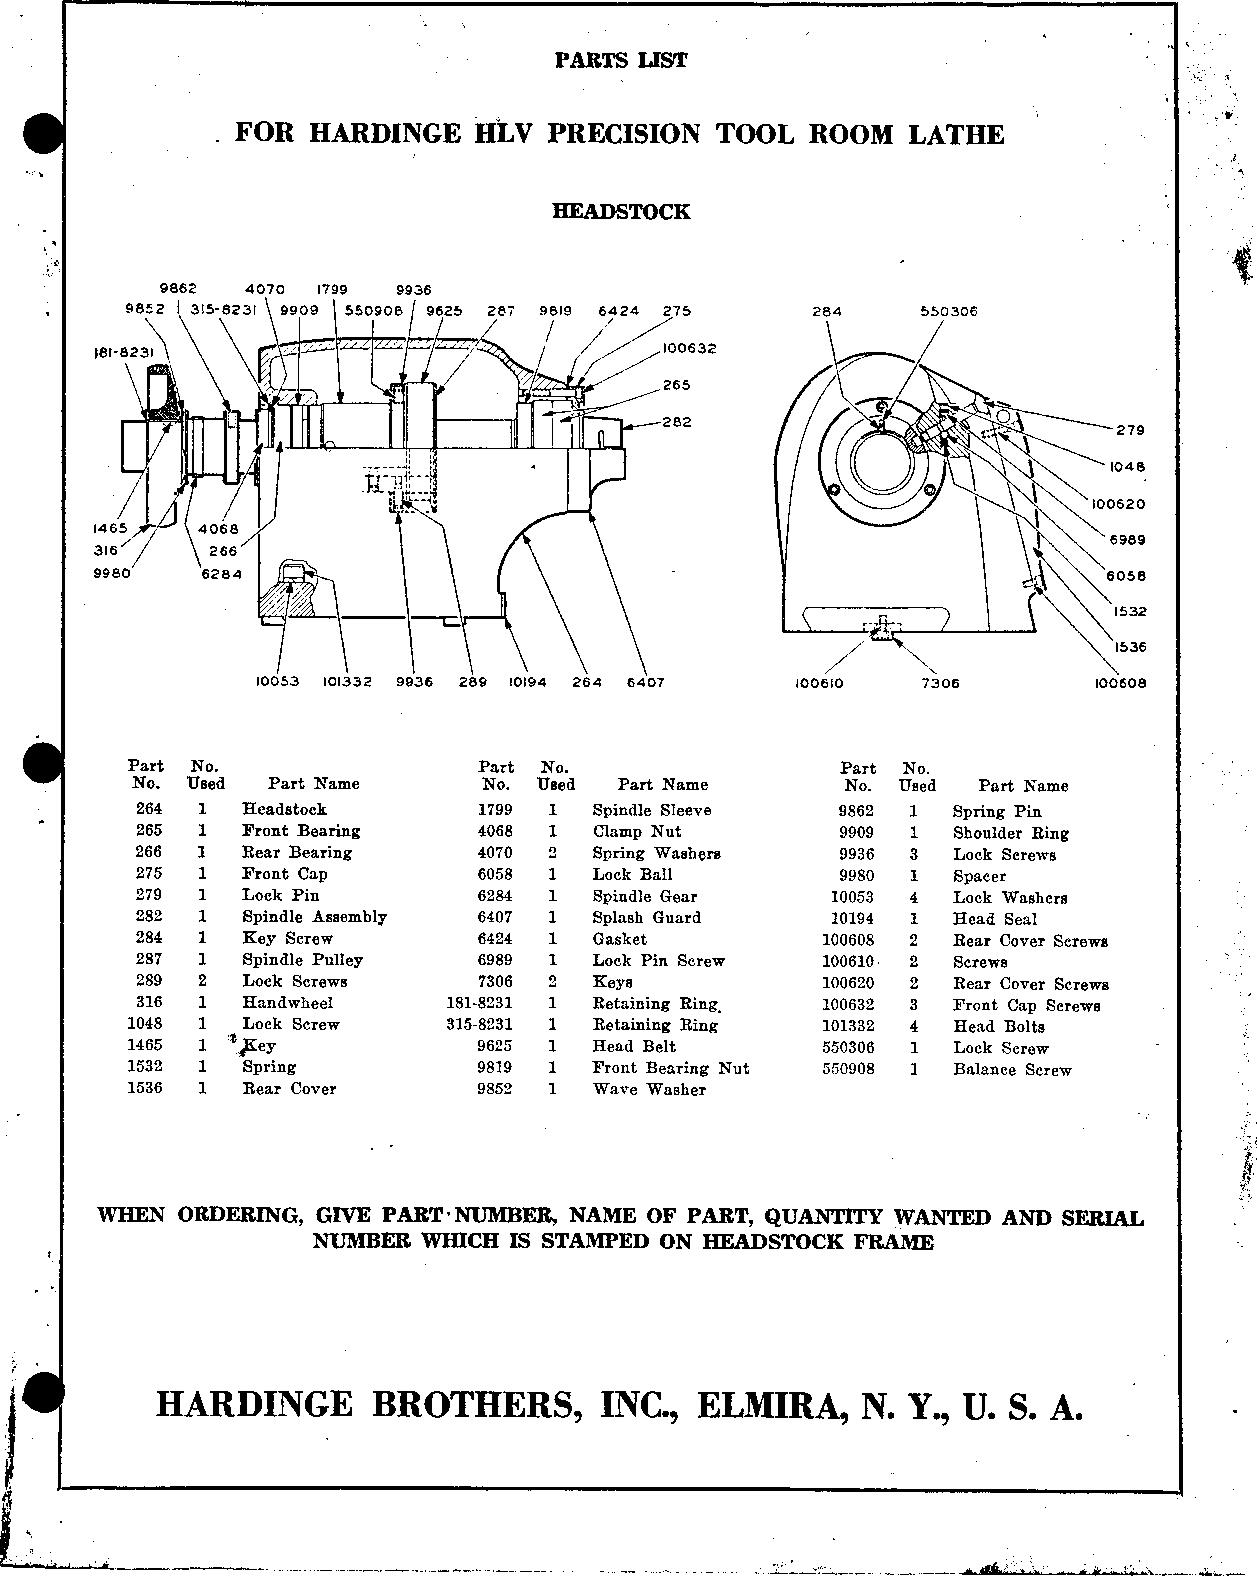 Hardinge Hlv Parts List